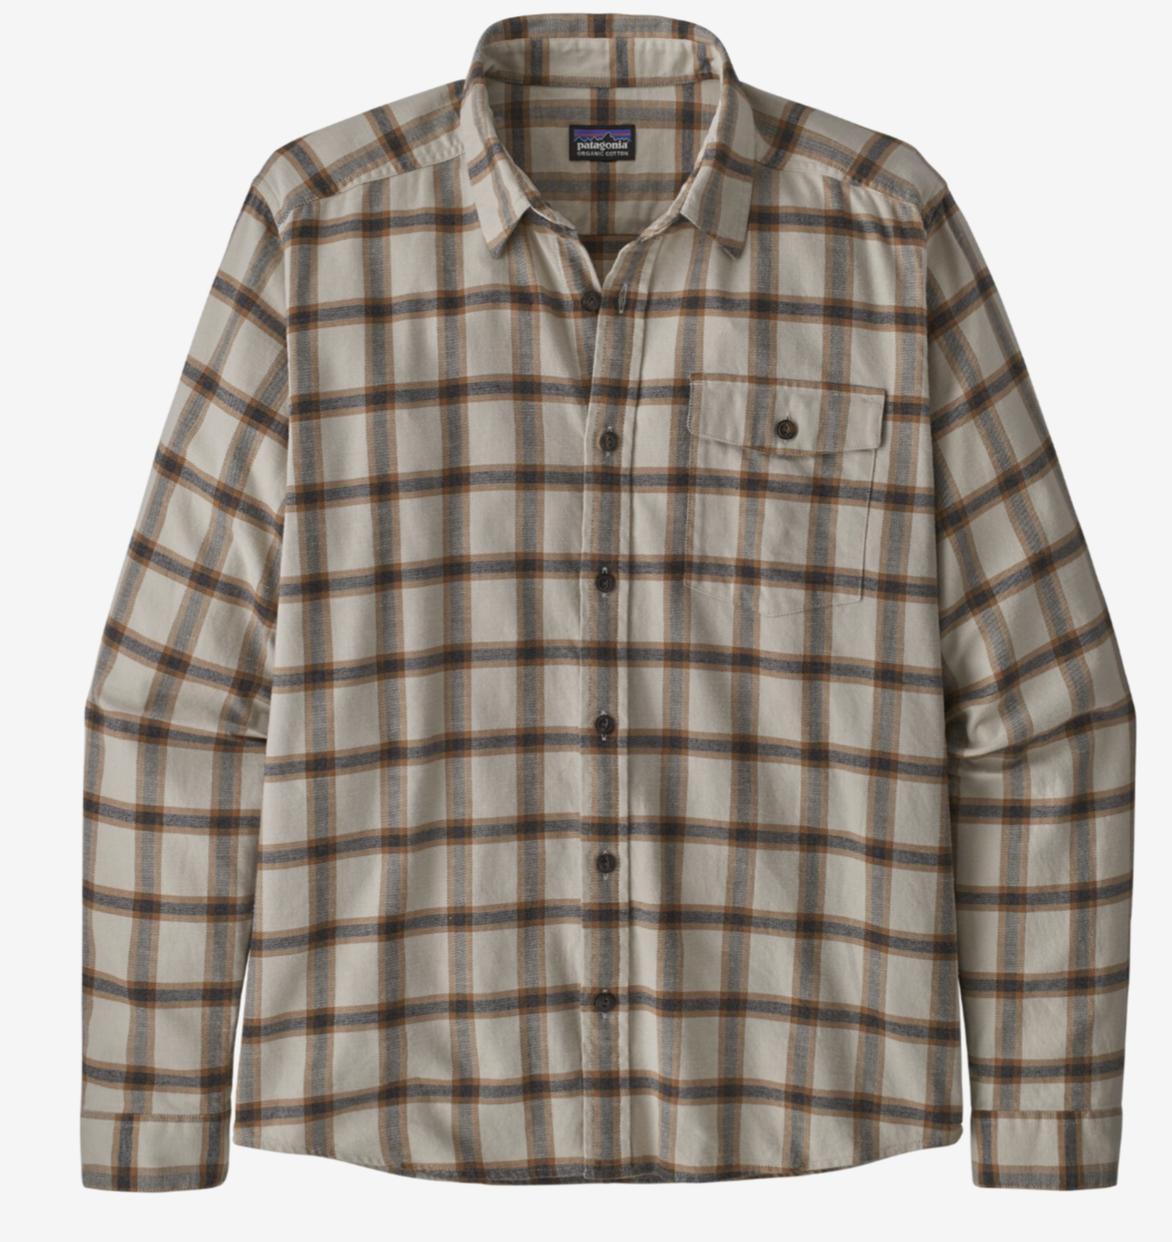 Patagonia Lightweight Fjord Flannel Shirt Men's